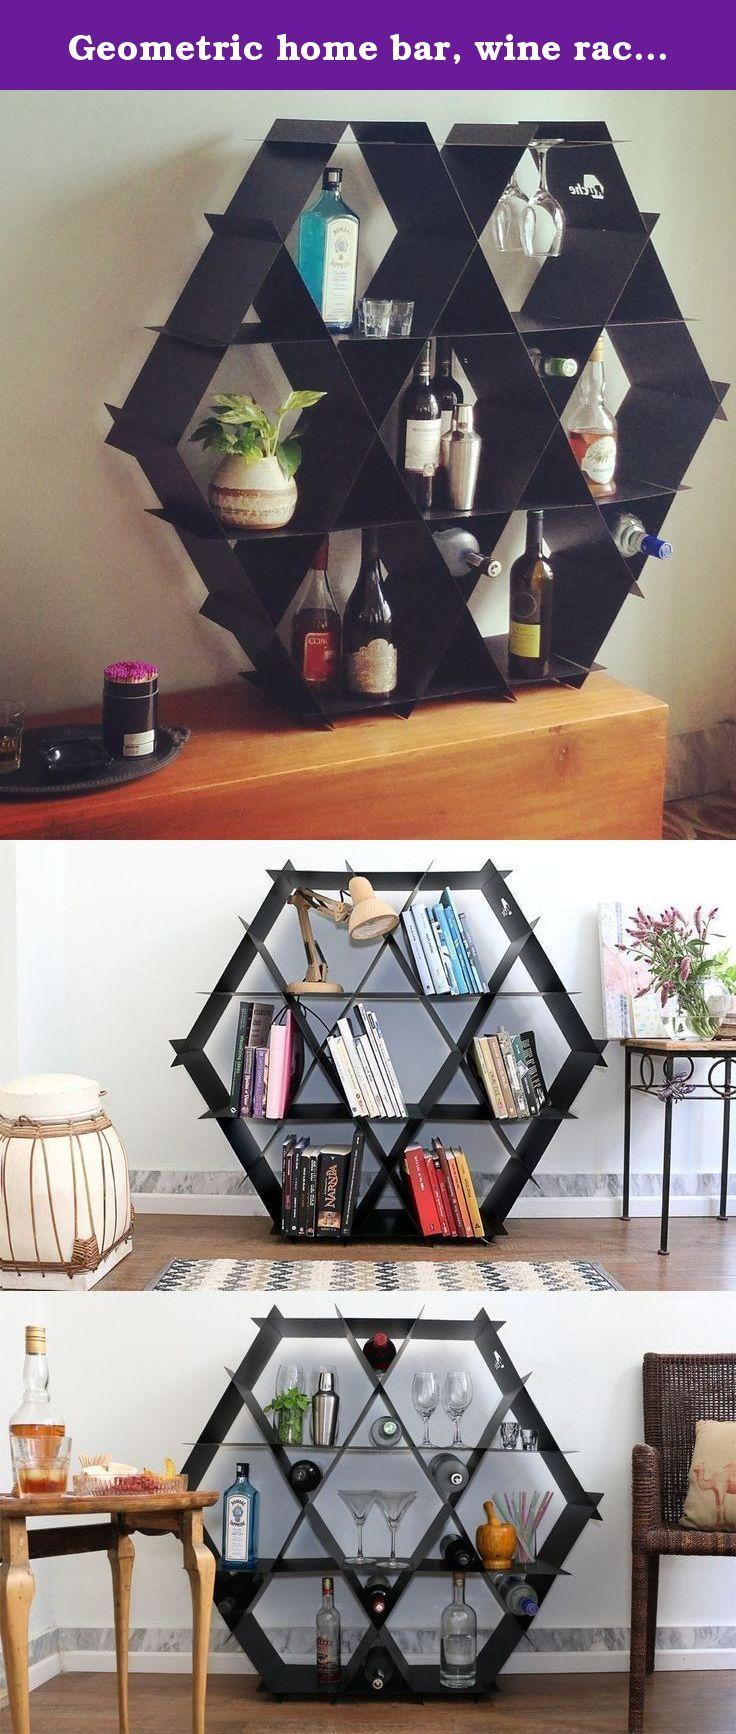 Geometric Home Bar Wine Rack Bookcase Bar Display Shelving Unit Hexagonal Shelf Honeycomb Shelves Diy Home Bar Furniture Honeycomb Shelves Cubby Shelves